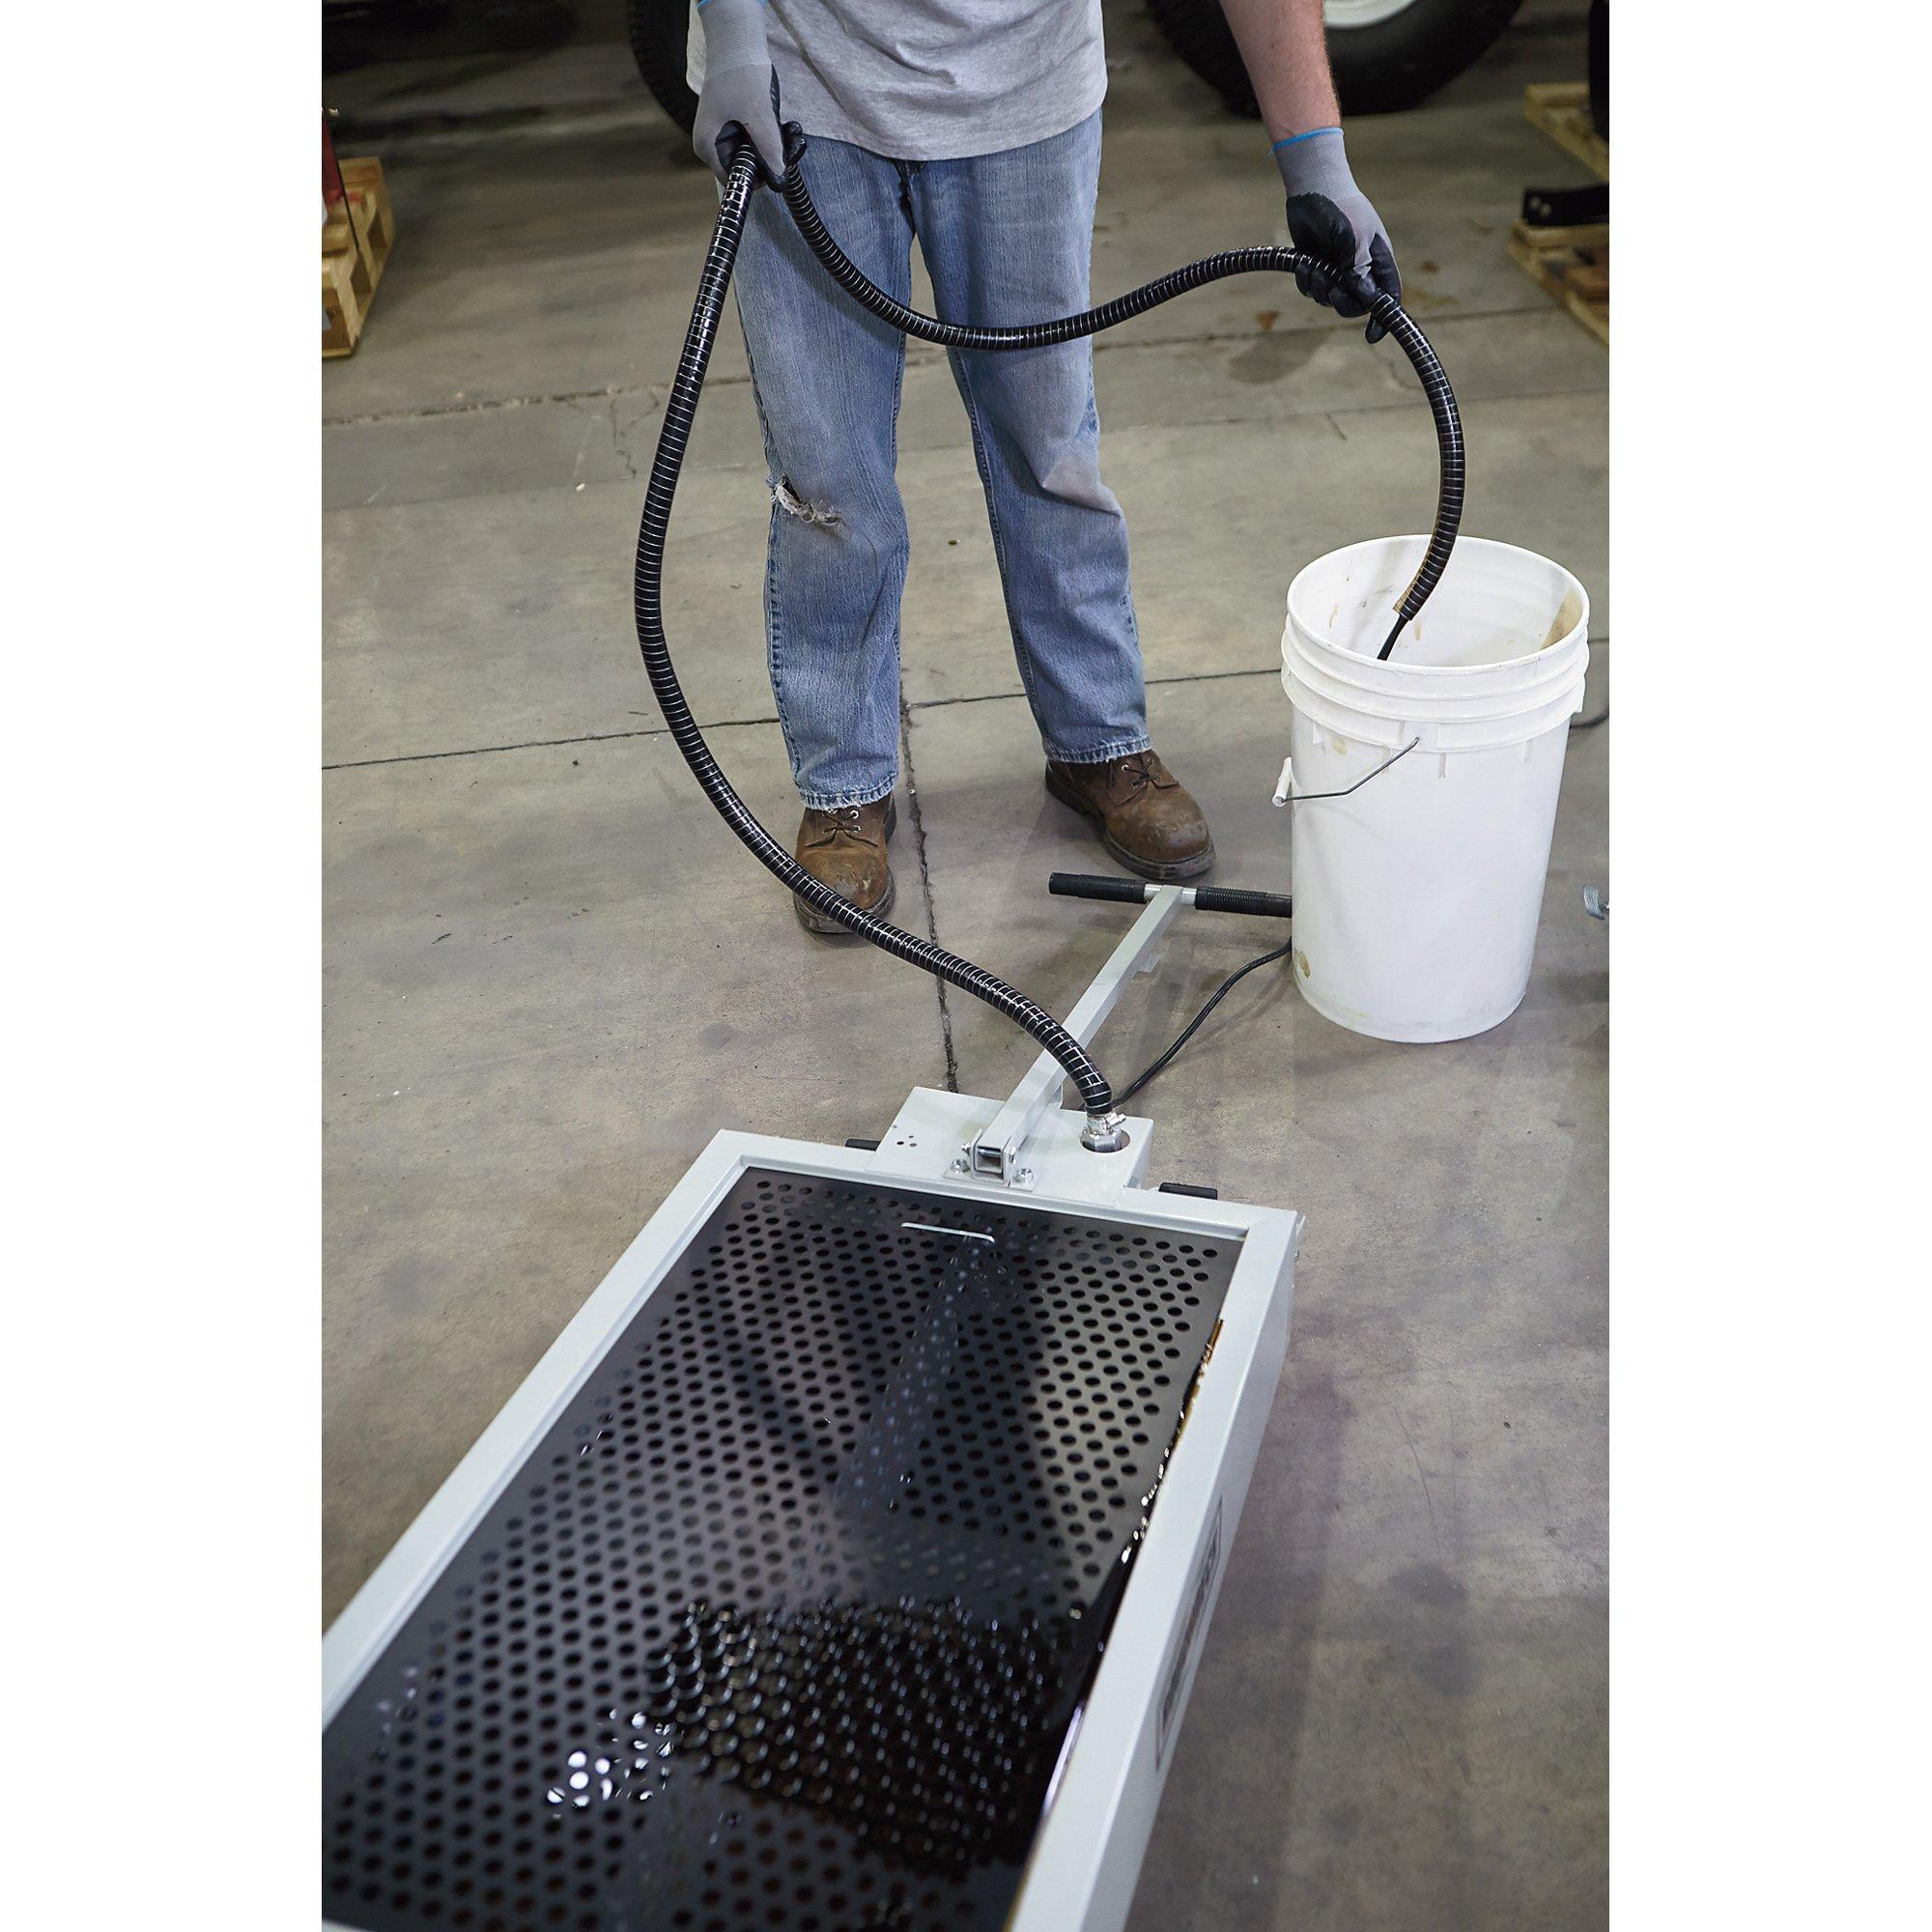 Roughneck Low-Profile Oil Drain - 15-Gallon, 110 Volt, 2.5 GPM Pump, Steel by Roughneck